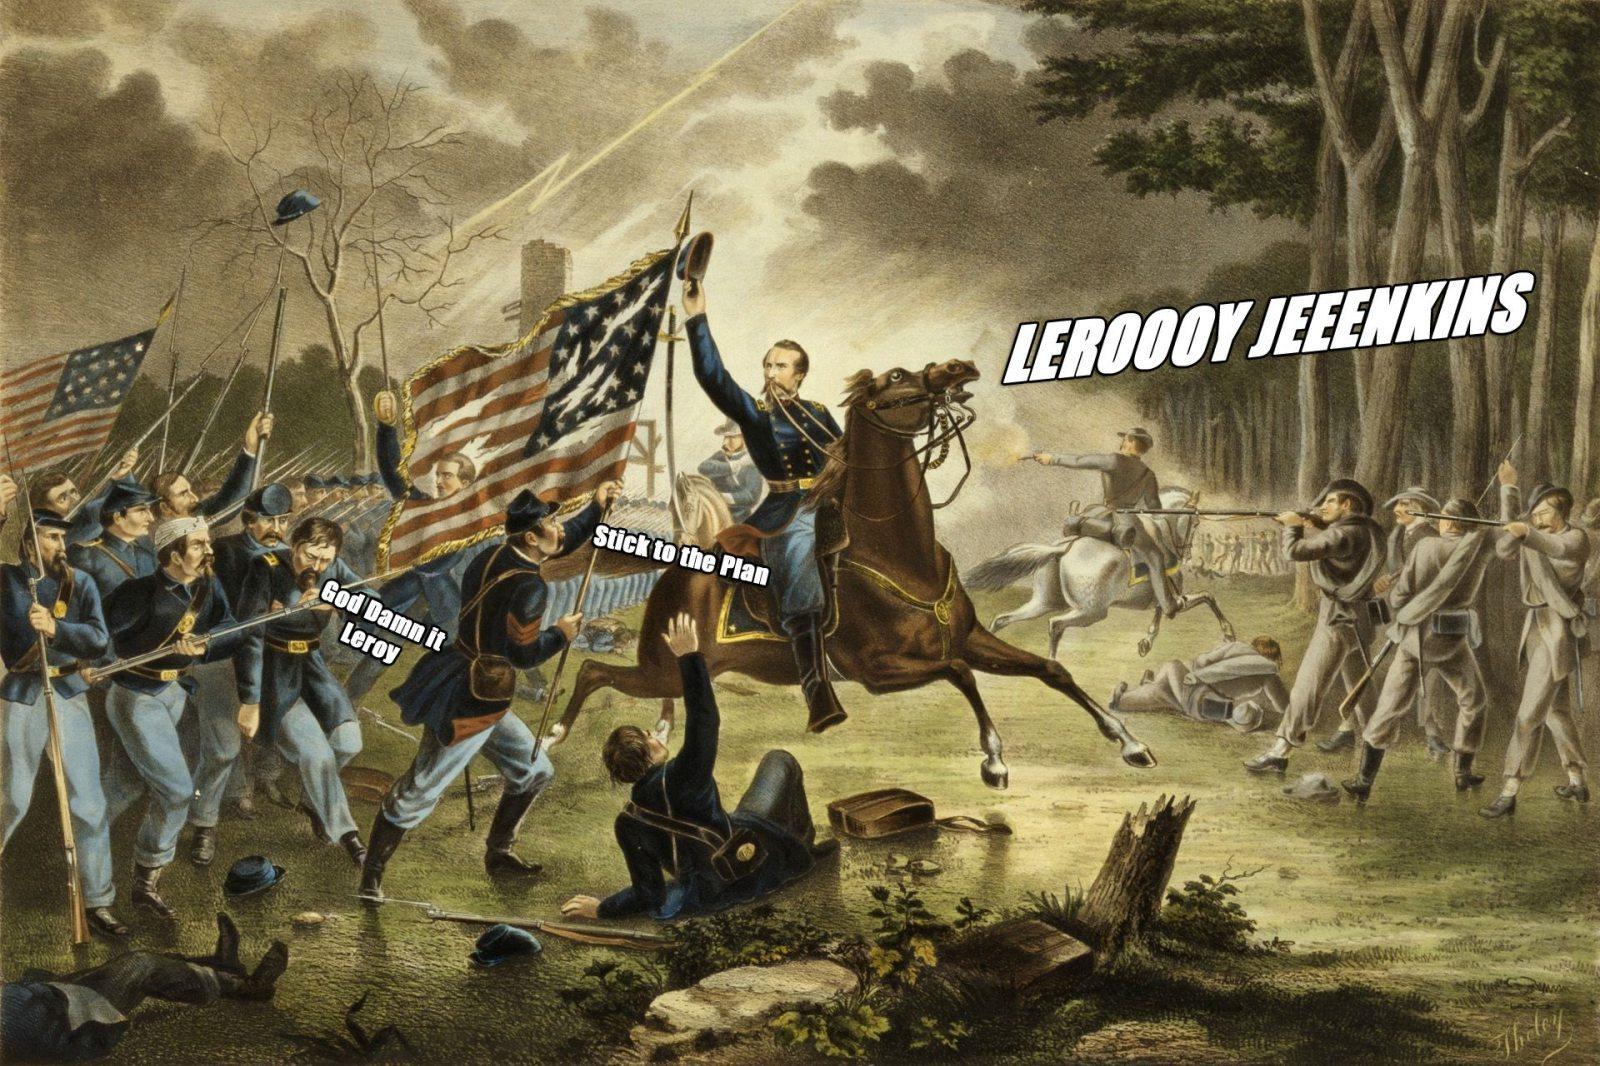 leeroy-jenkins-civil-war-wallpaper.jpg